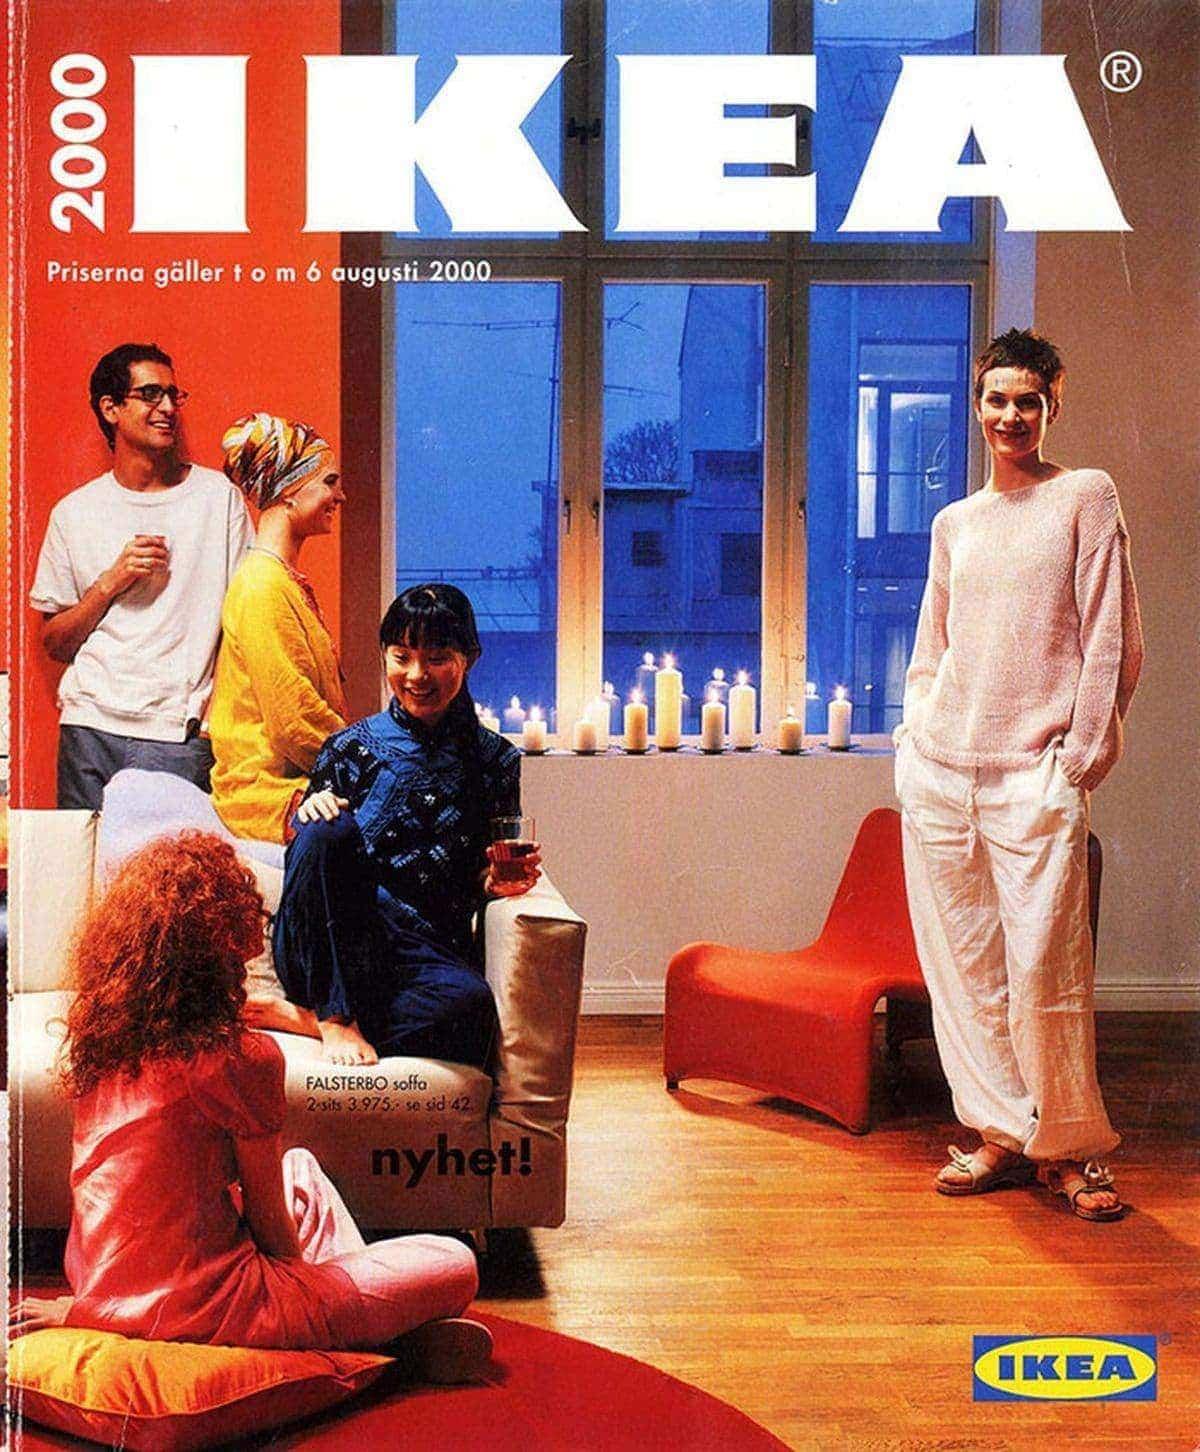 ikea katalog cover im wandel der zeit was is hier eigentlich los. Black Bedroom Furniture Sets. Home Design Ideas